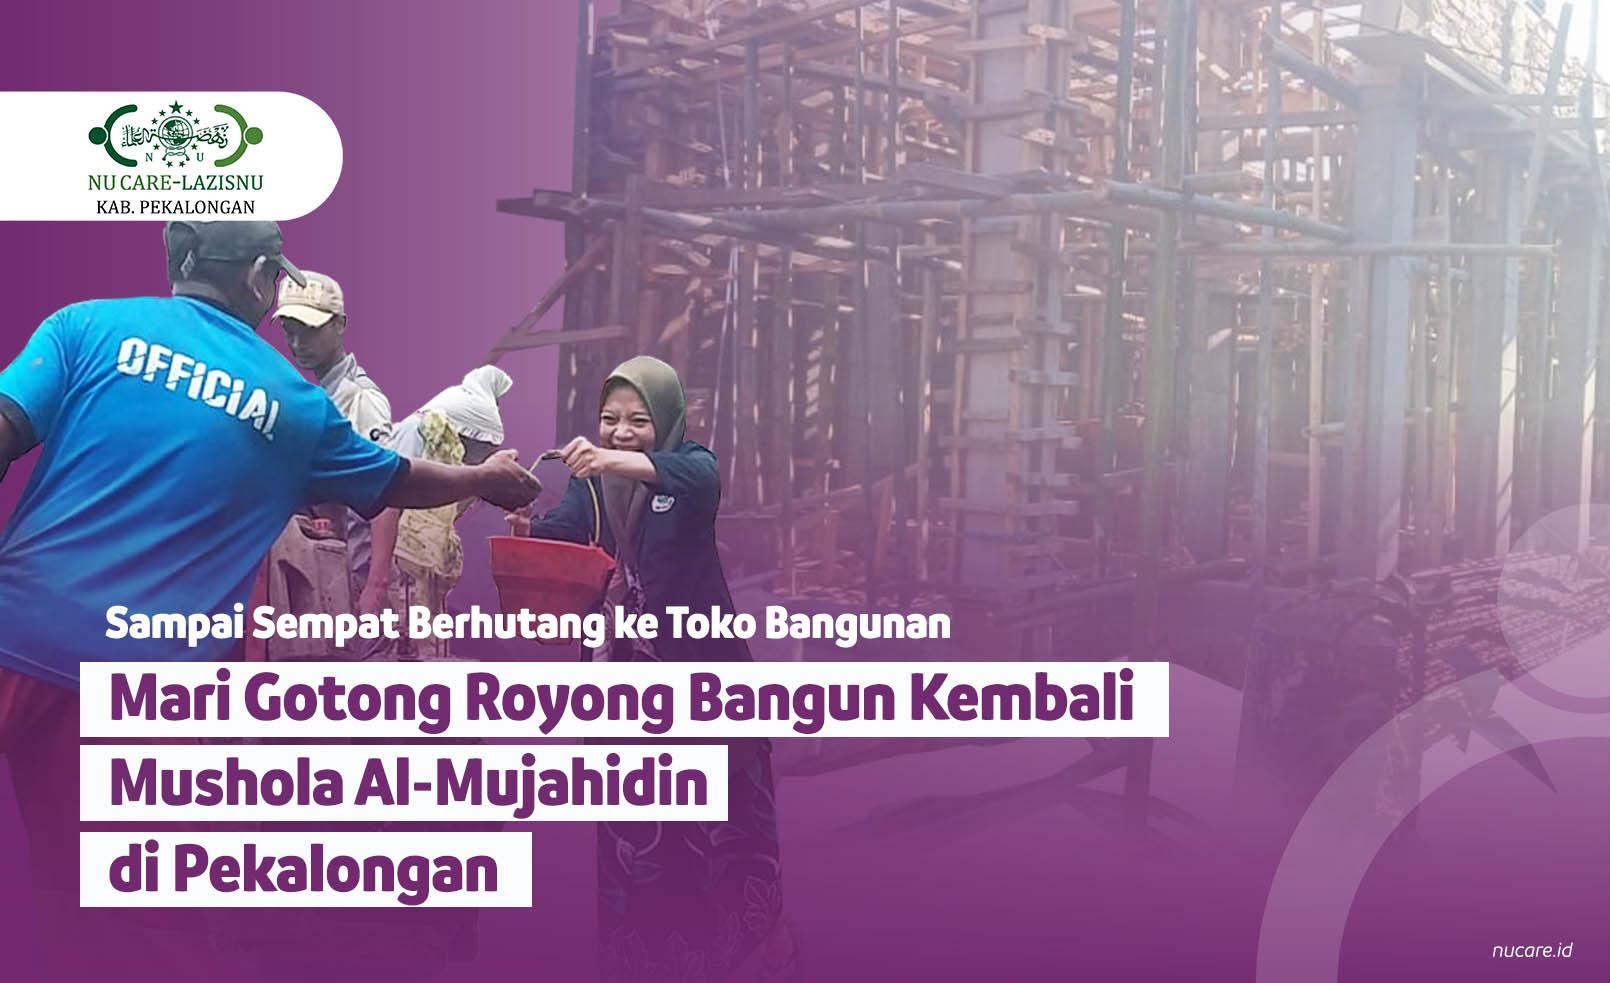 Mari Bangun Kembali Mushola Al-Mujahidin!